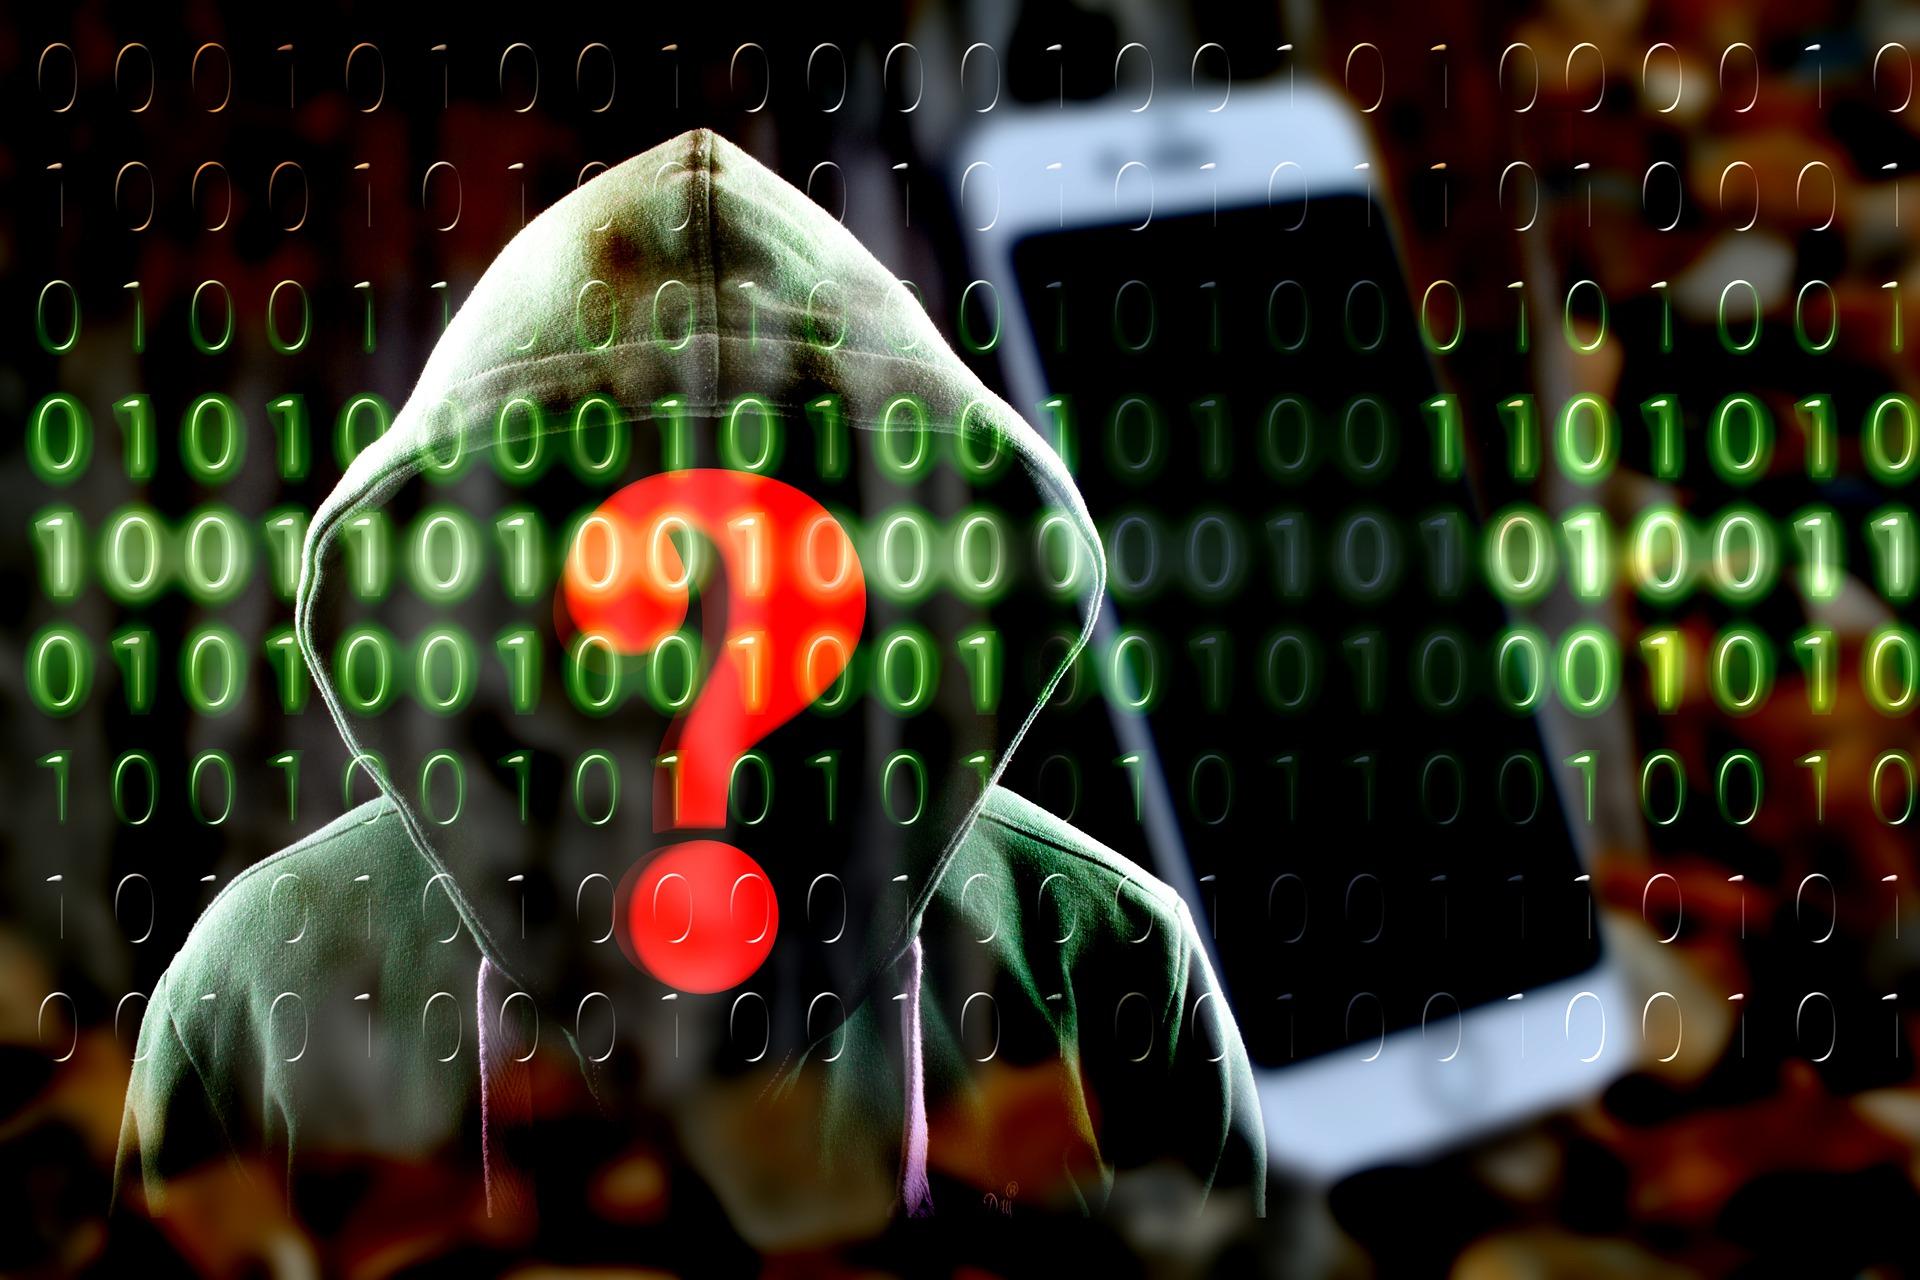 marche cyberassurance 30 milliards dollars 2026 - Blog SFAM